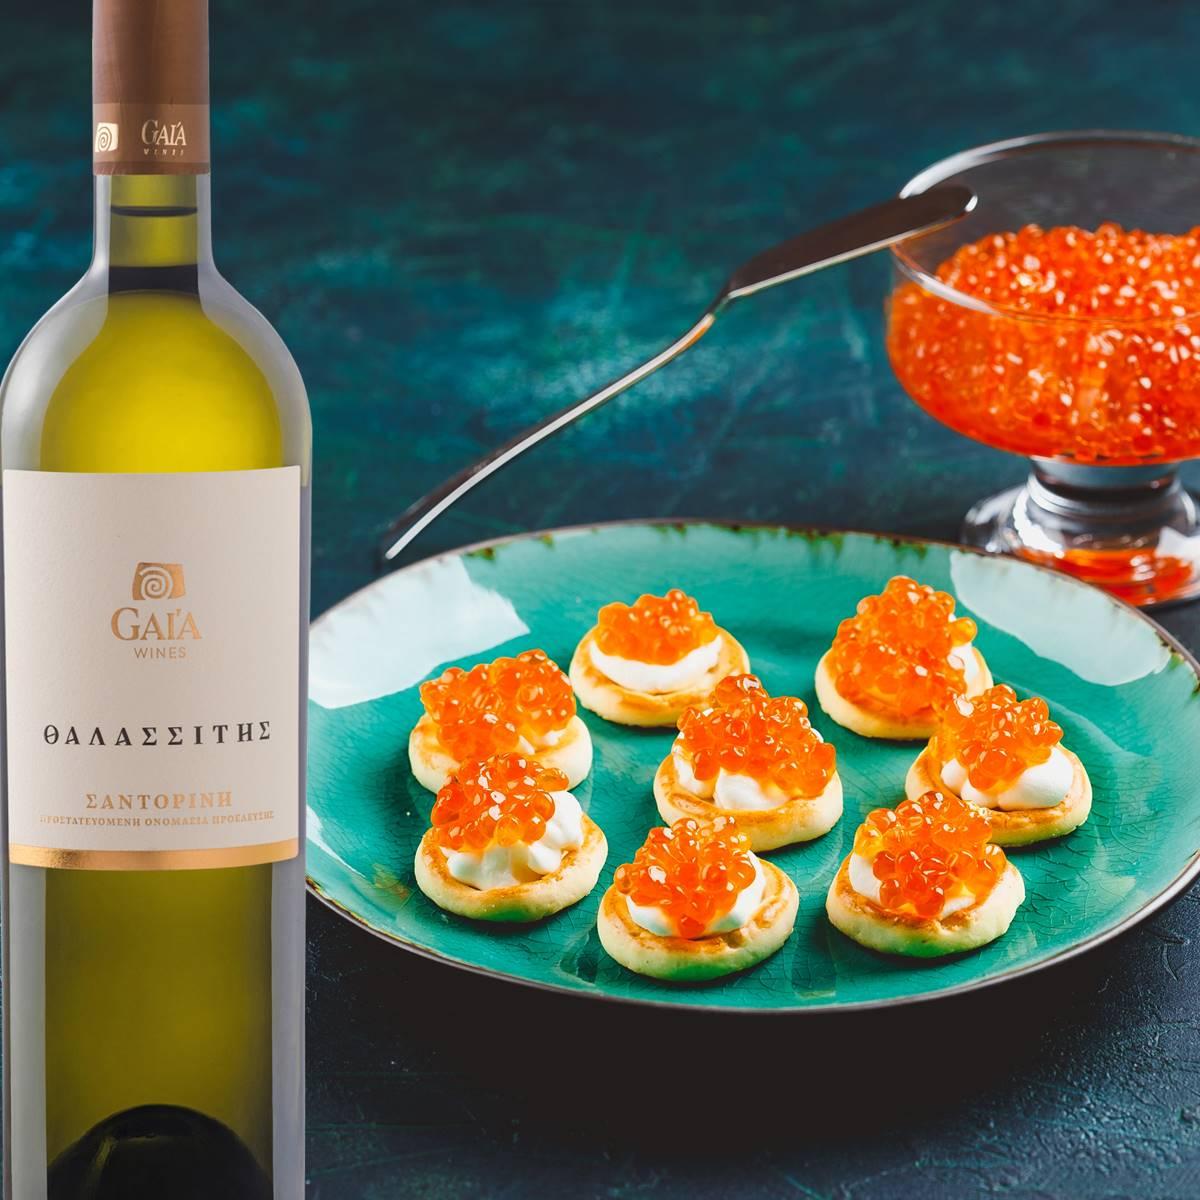 Wine Pairing ΘΑΛΑΣΣΙΤΗΣ, Λευκό - Gaia Wines